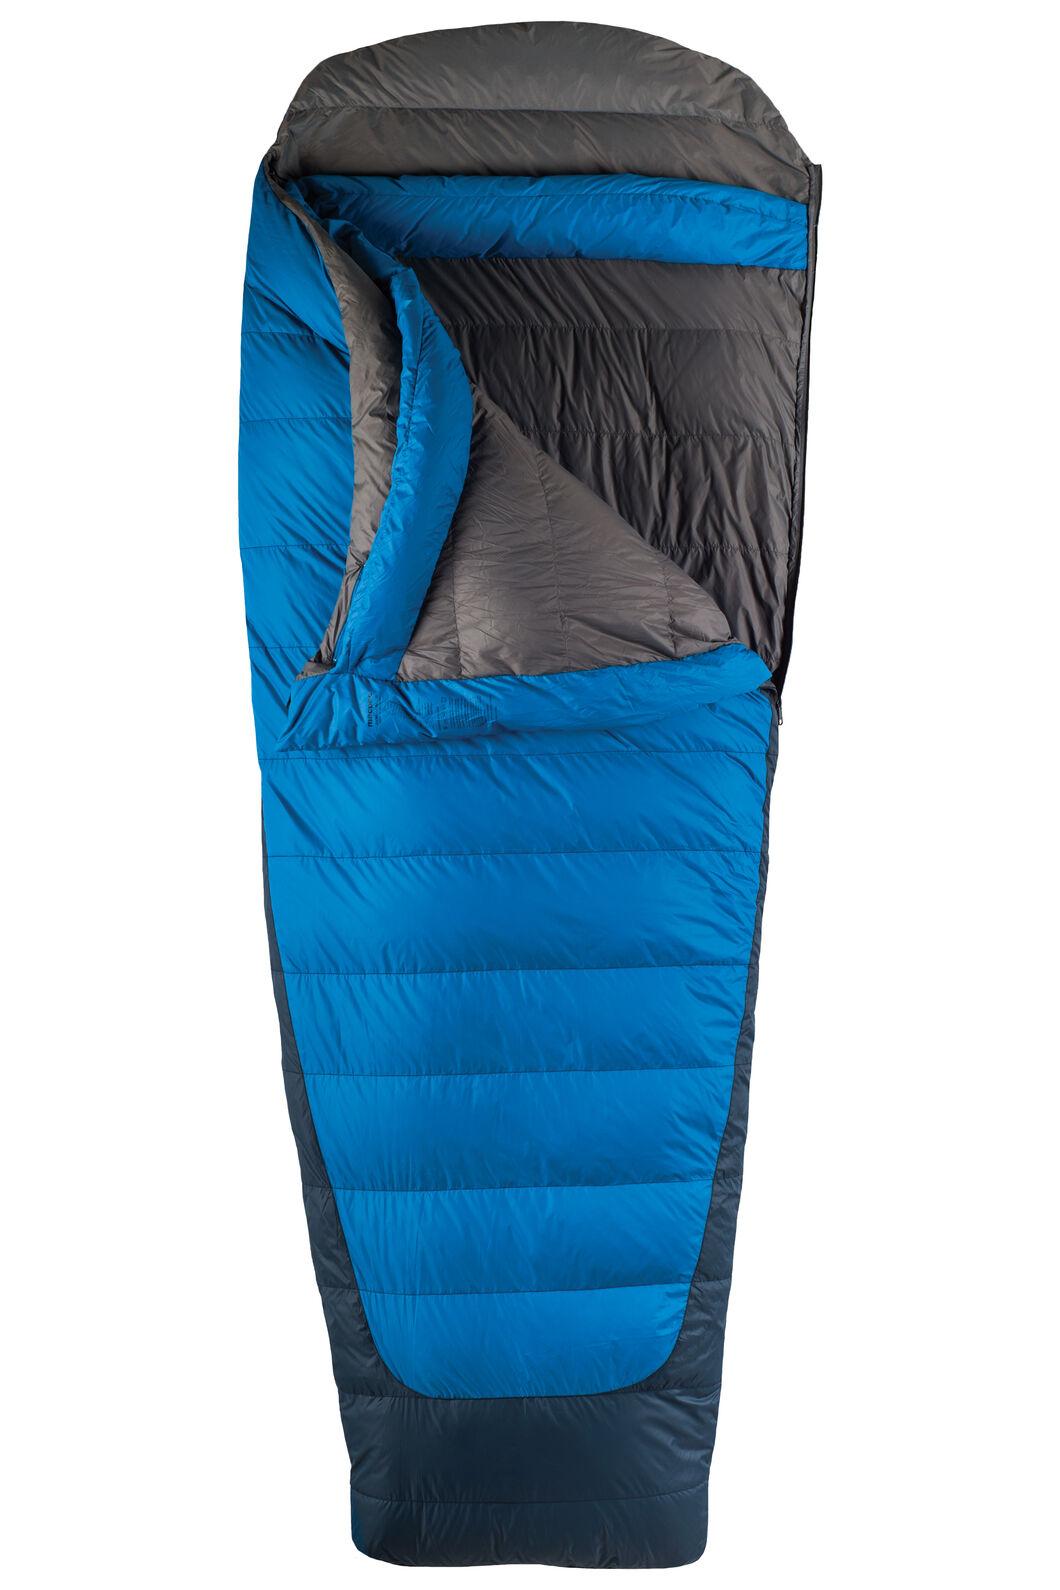 Macpac Escapade Down 700 Sleeping Bag - Standard, Classic Blue, hi-res